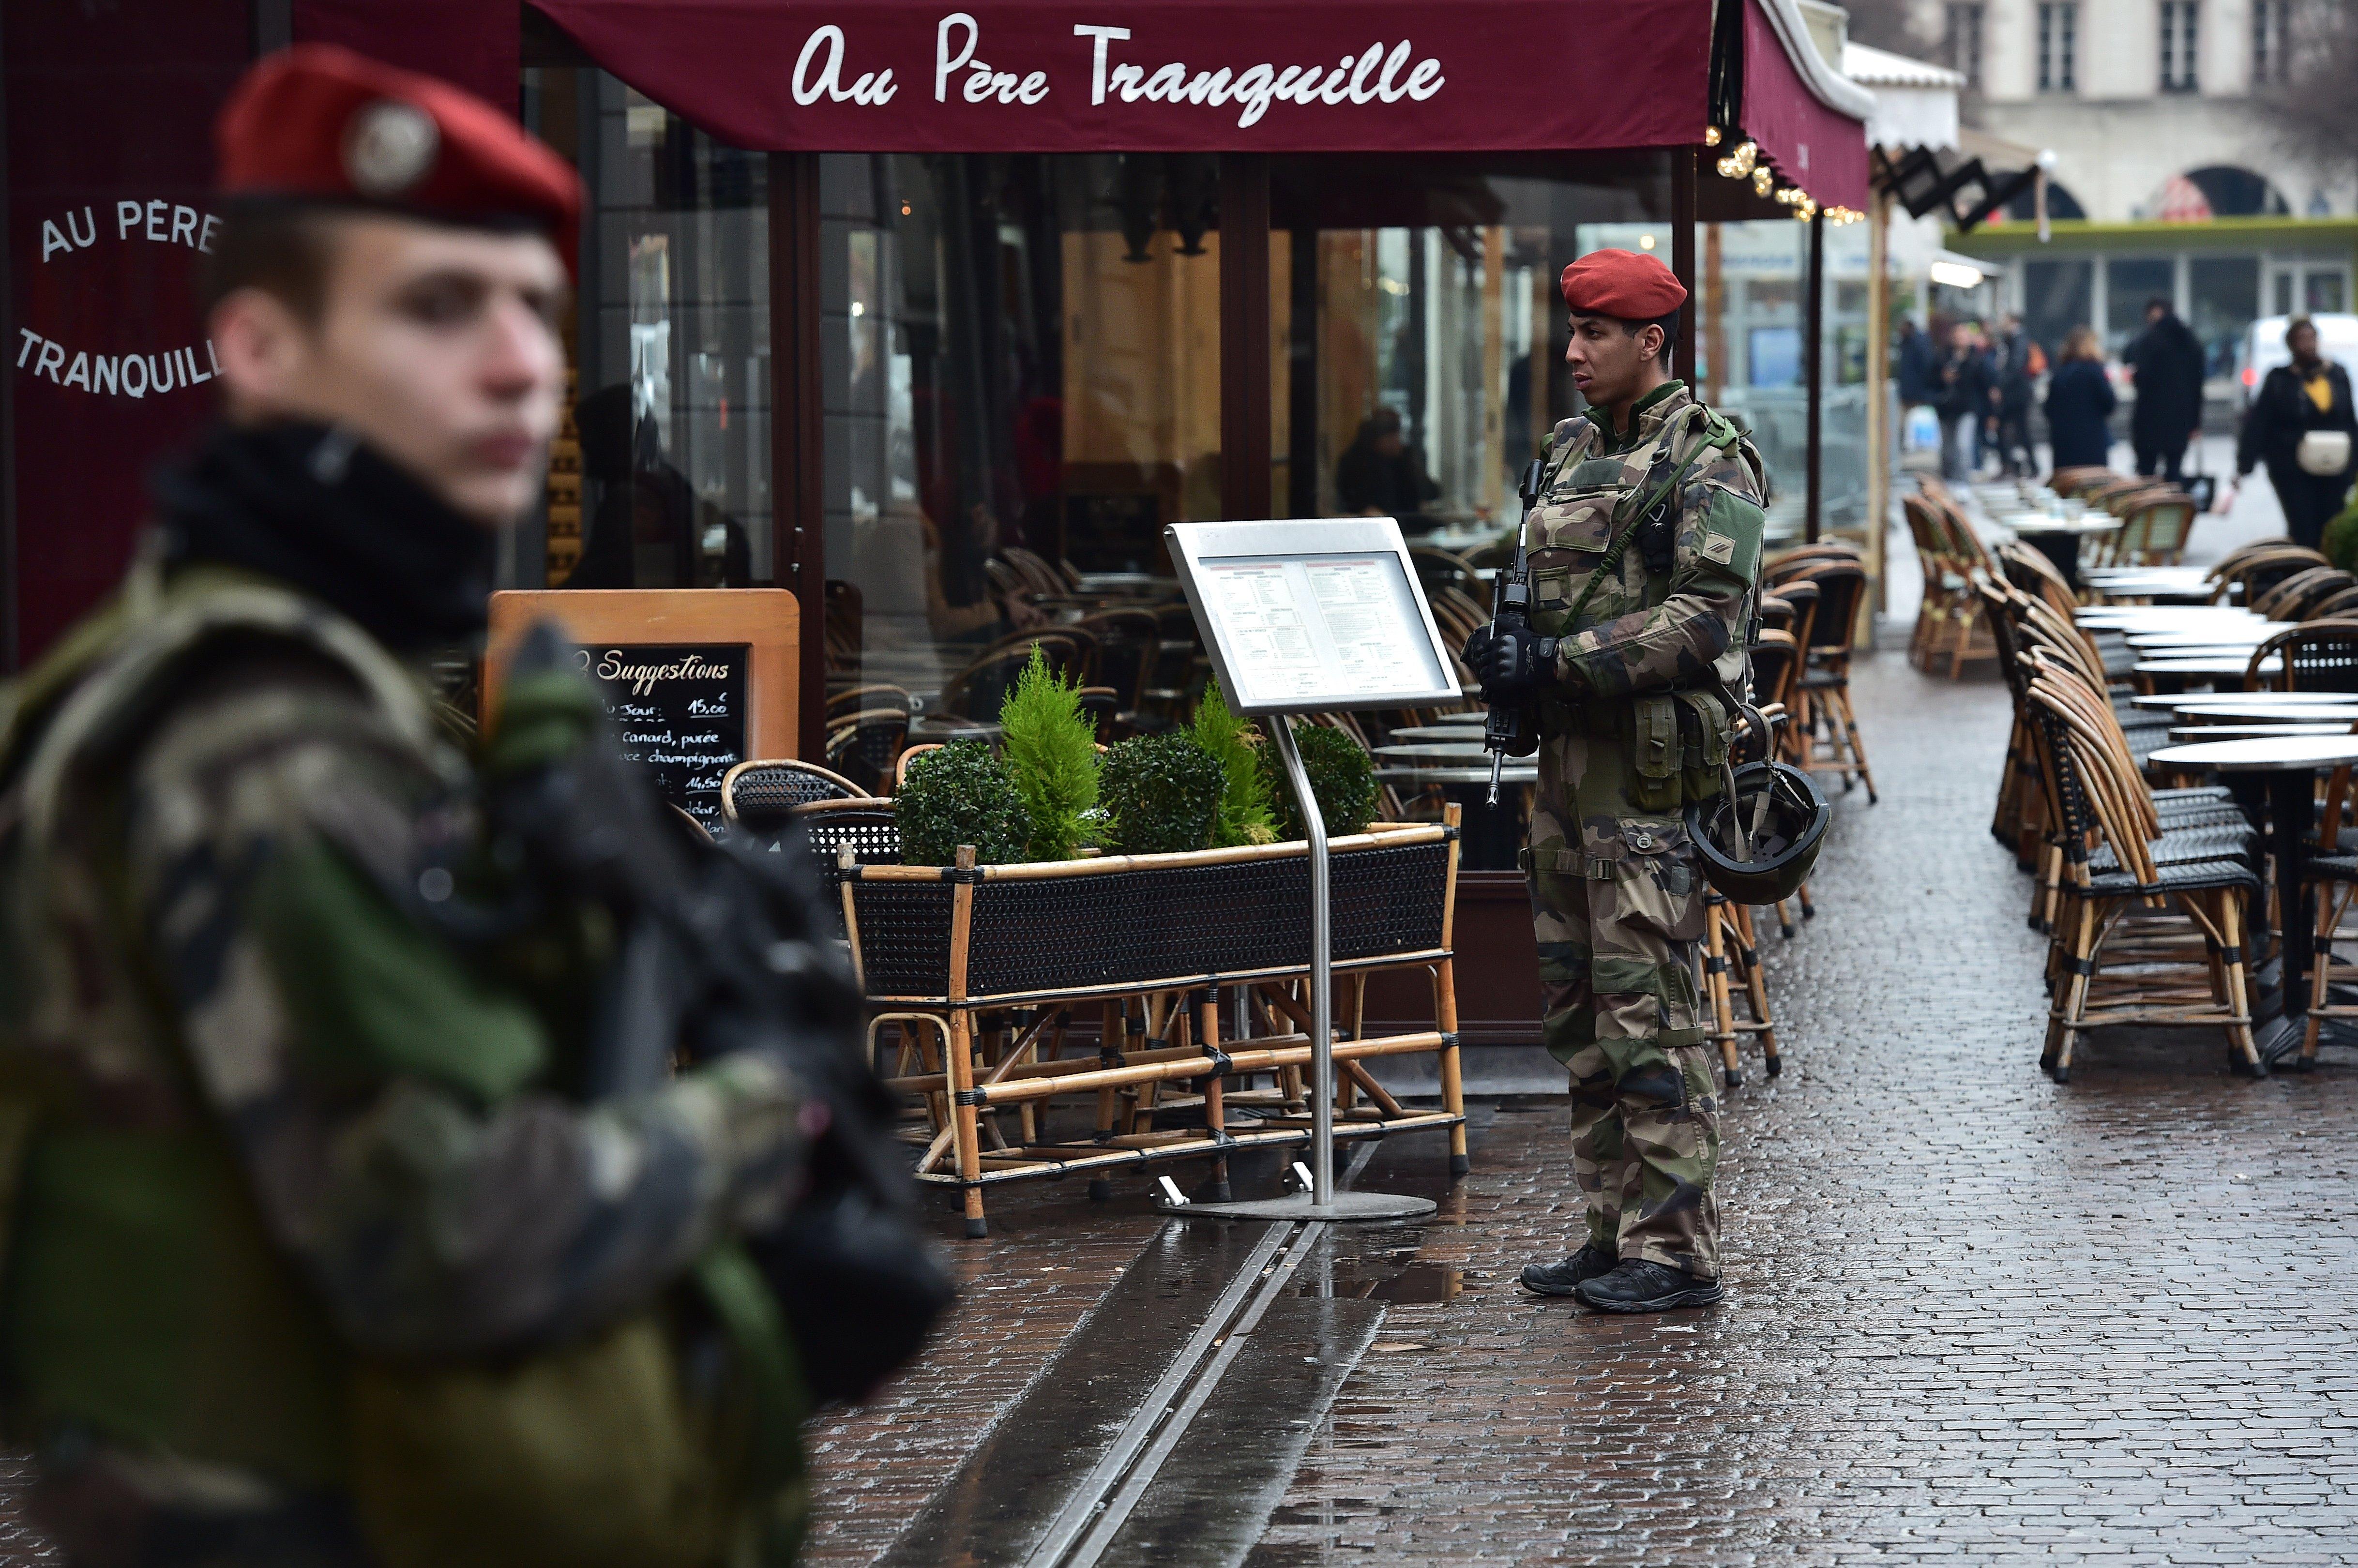 France restructuring domestic Sentinel anti-terrorism mission